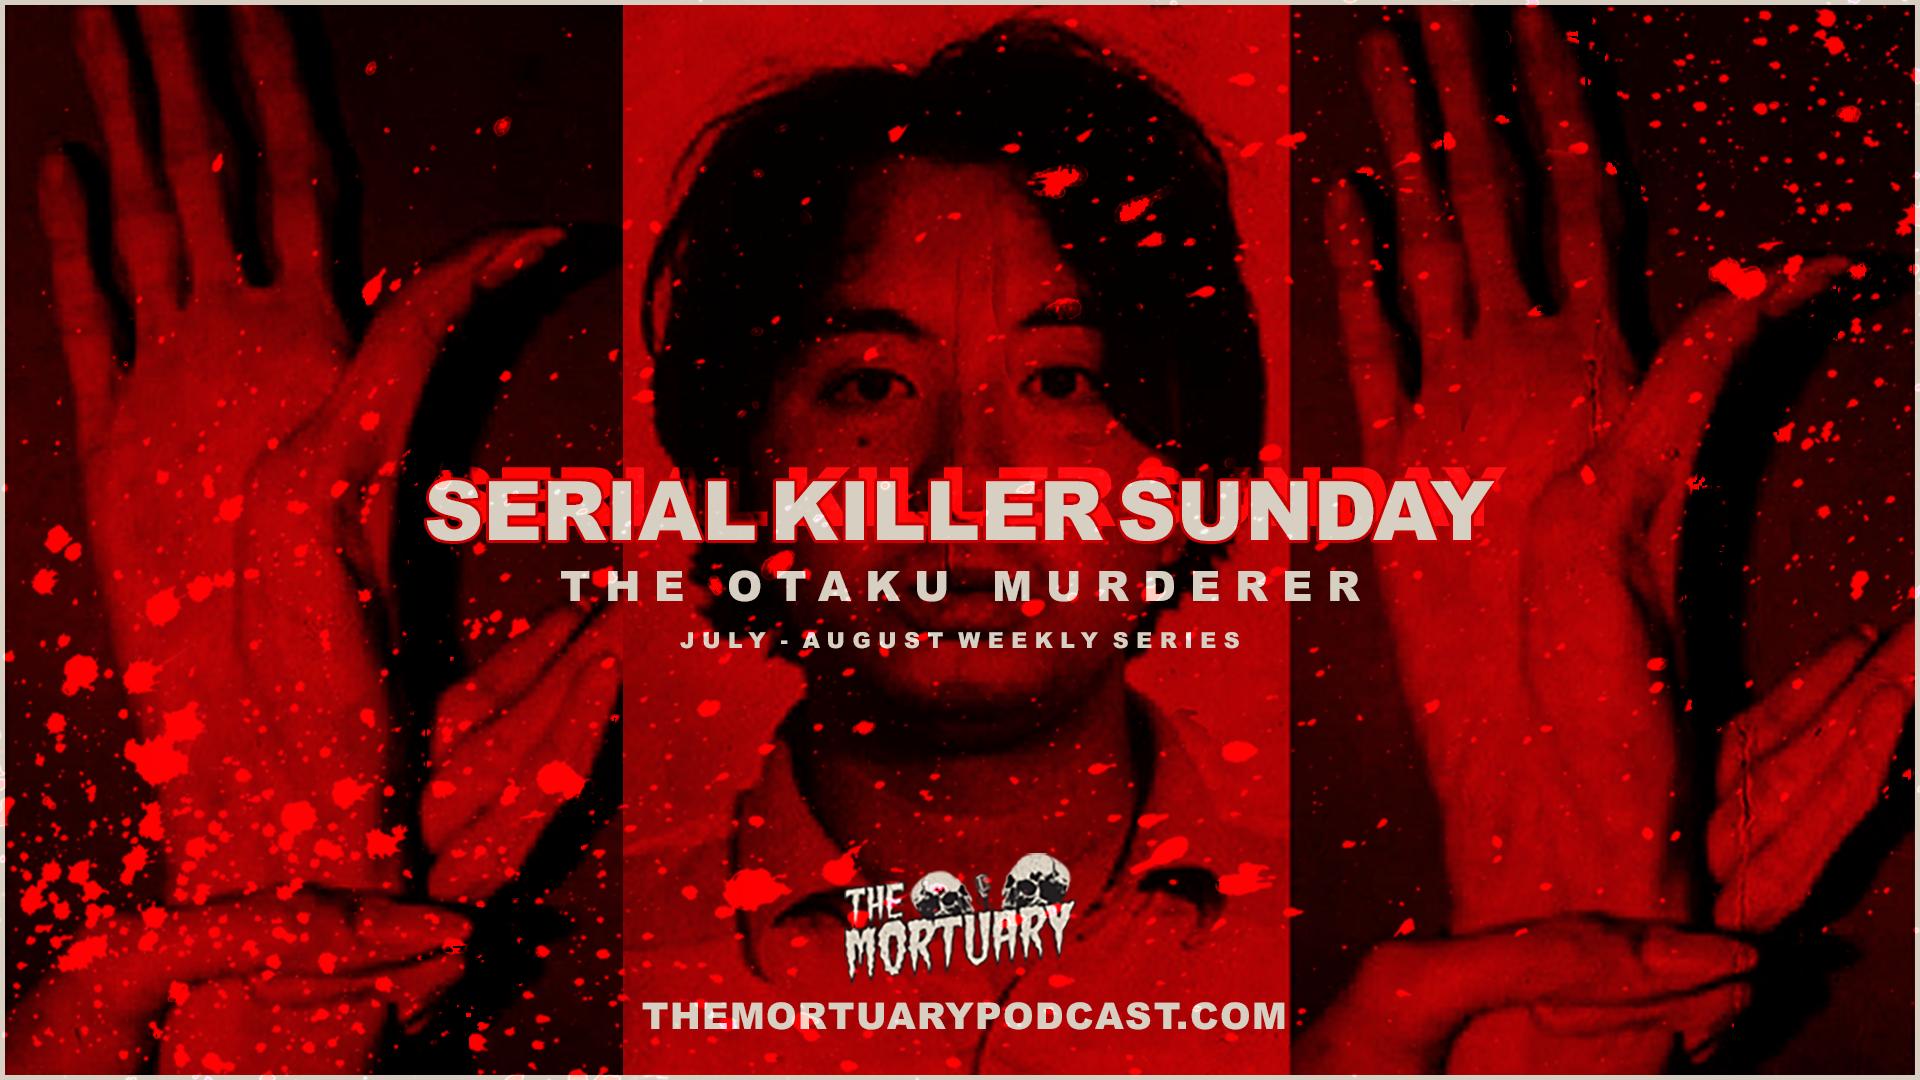 otaku Serial Killer Sunday 2019 Thumb Template.png